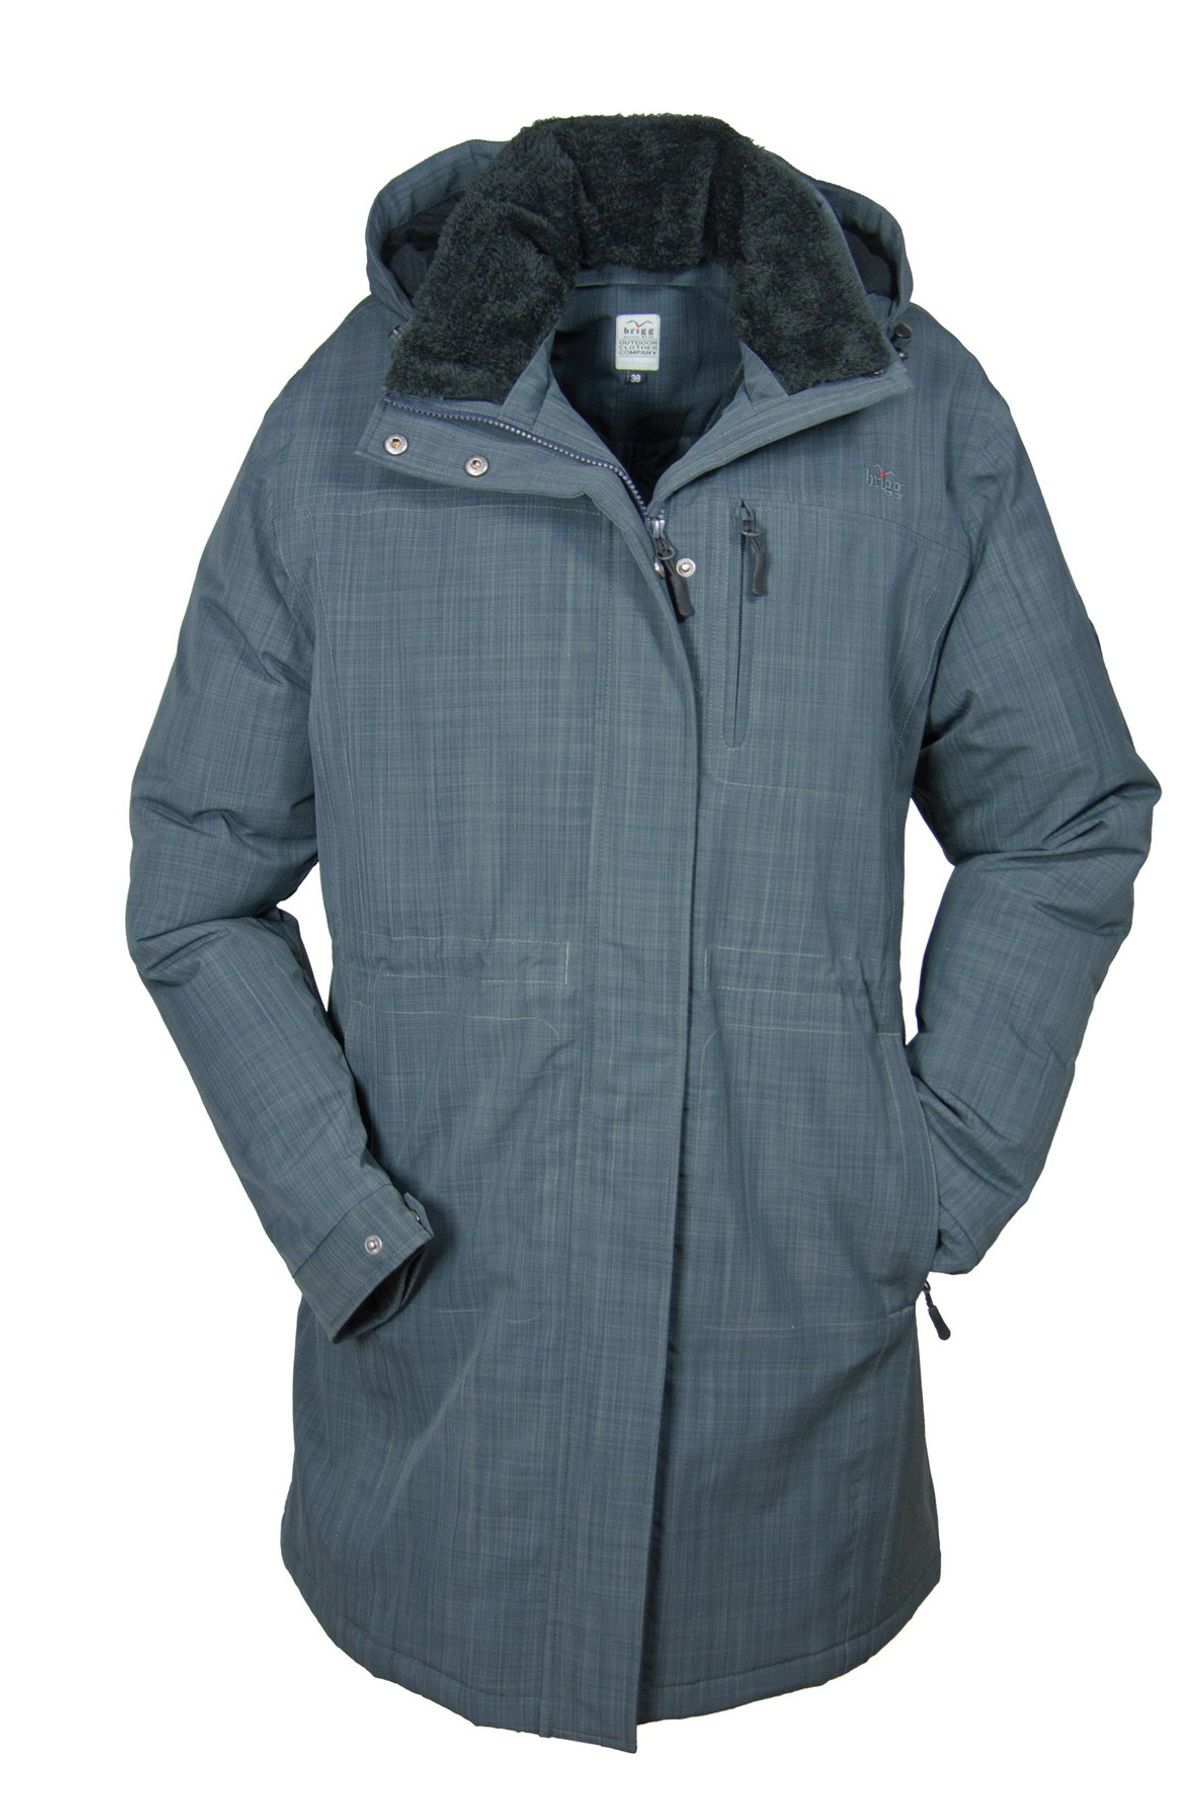 Brigg - Damen Funktions Mantel, Farbe Granit (10 778 516)